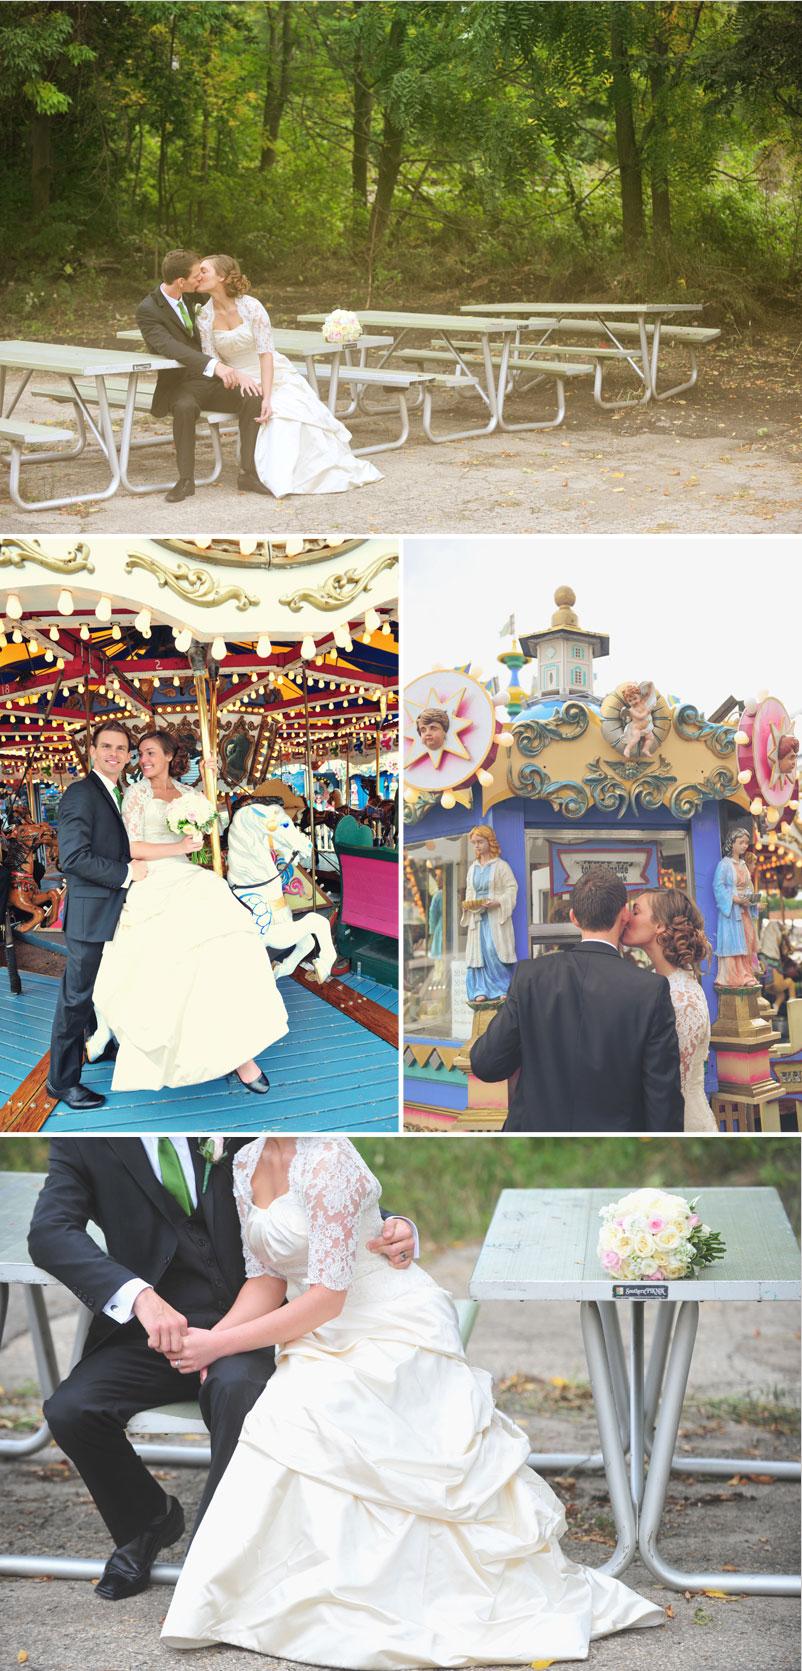 aurora illinois wedding photographer, madison wisconsin wedding photographer, classic wedding photography aurora illinois, timeless wedding photography aurora illinois